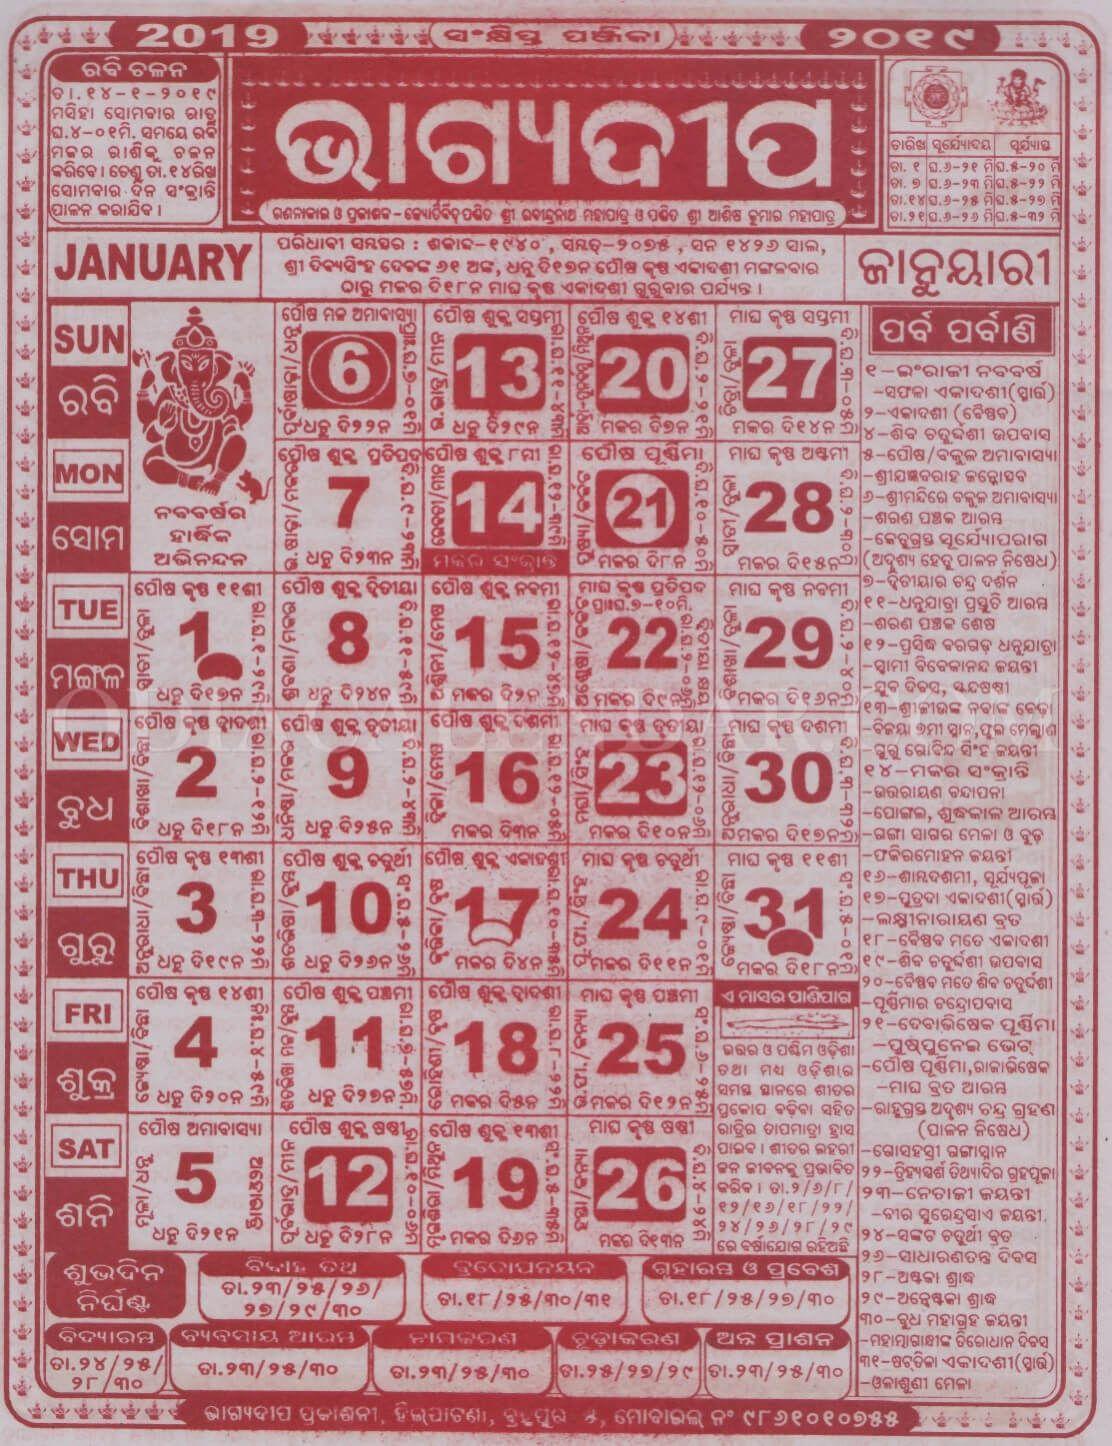 Bhagyadeep Calendar January 2019 | Calendar, Free, High pertaining to Oriya Calendar 2020 February